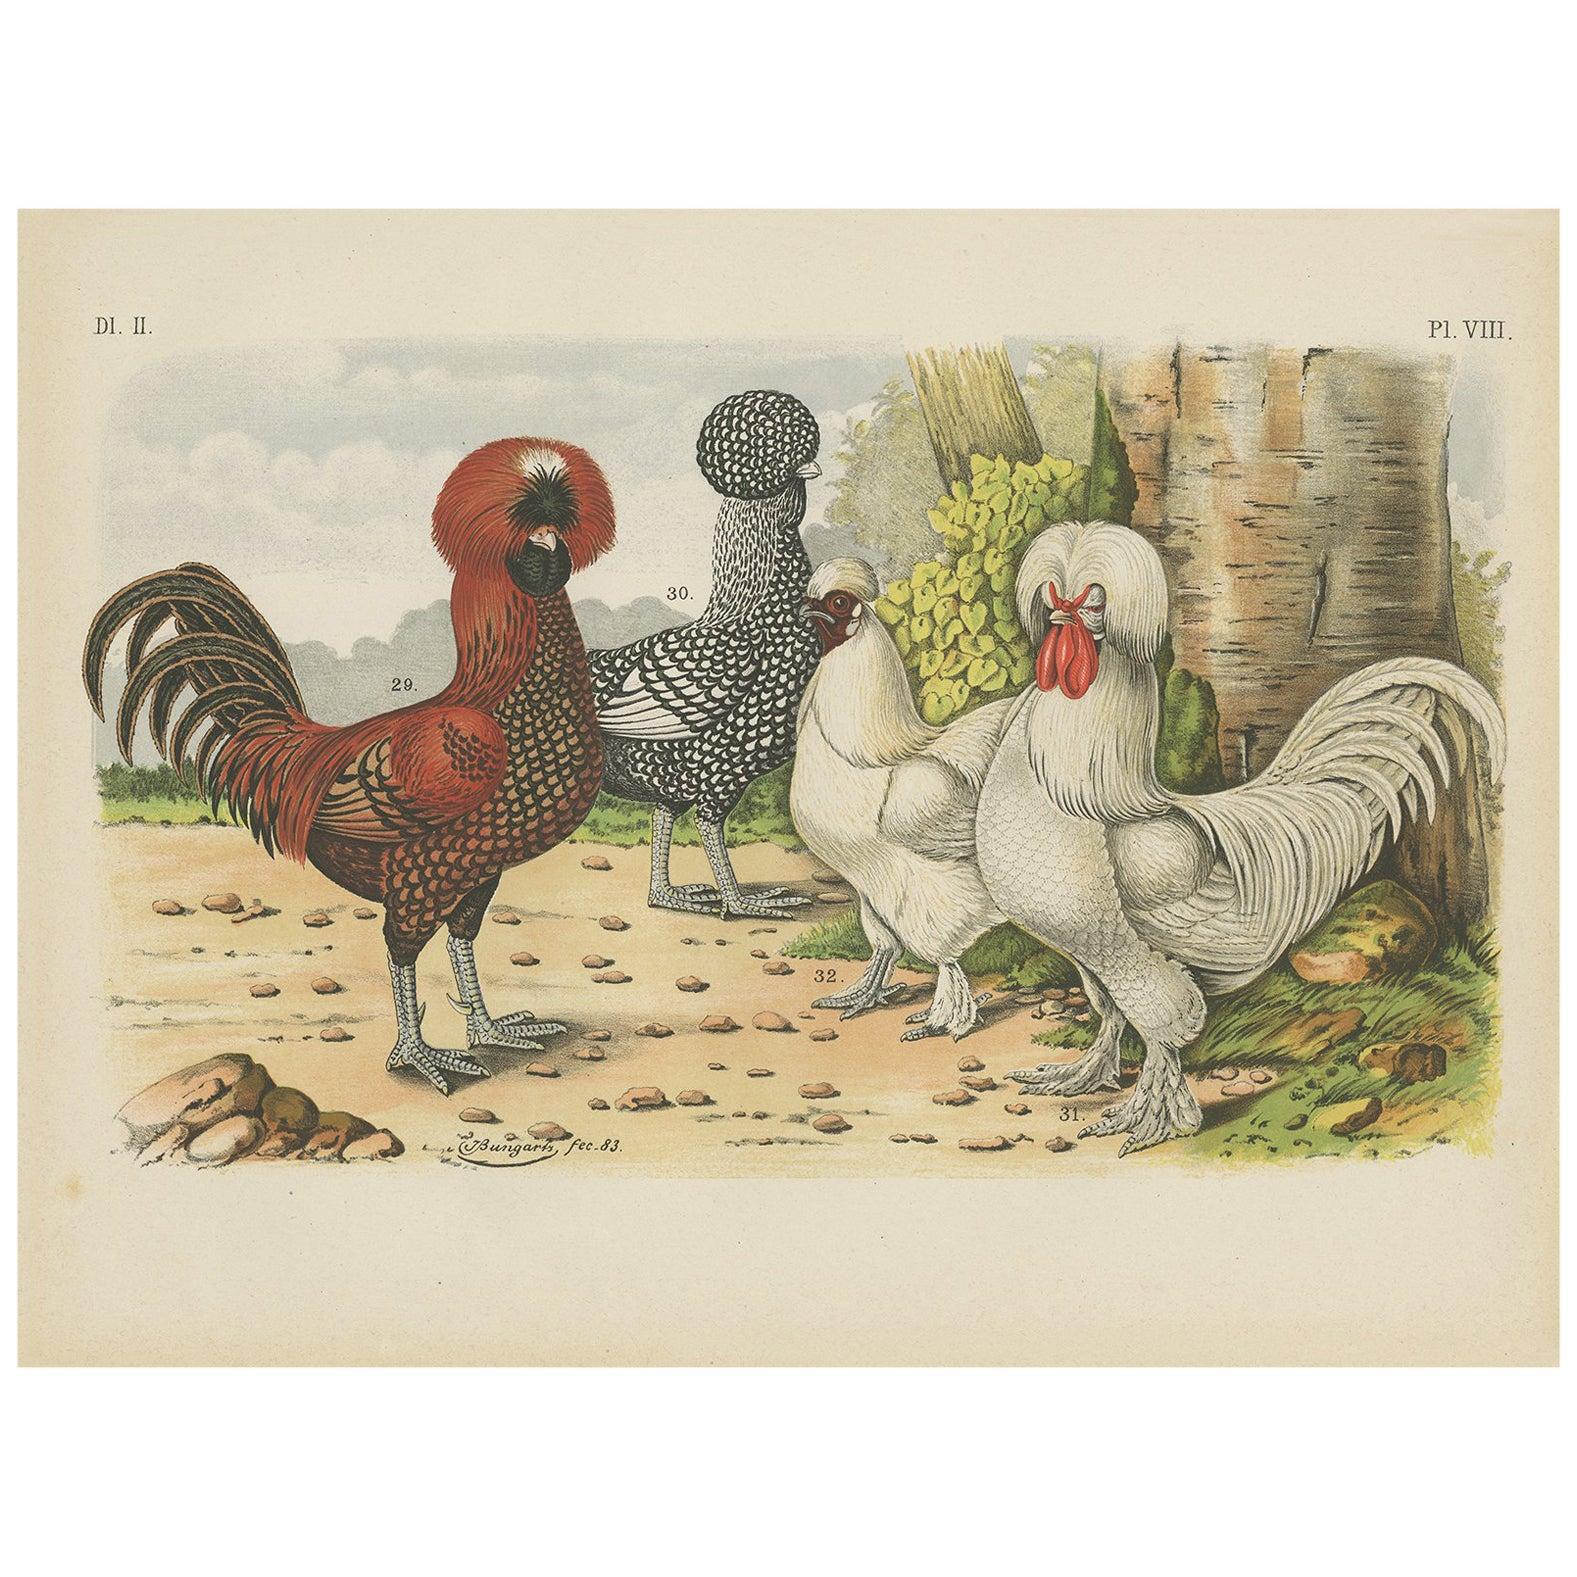 Antique Bird Print of Polish or Poland Chickens (1886)